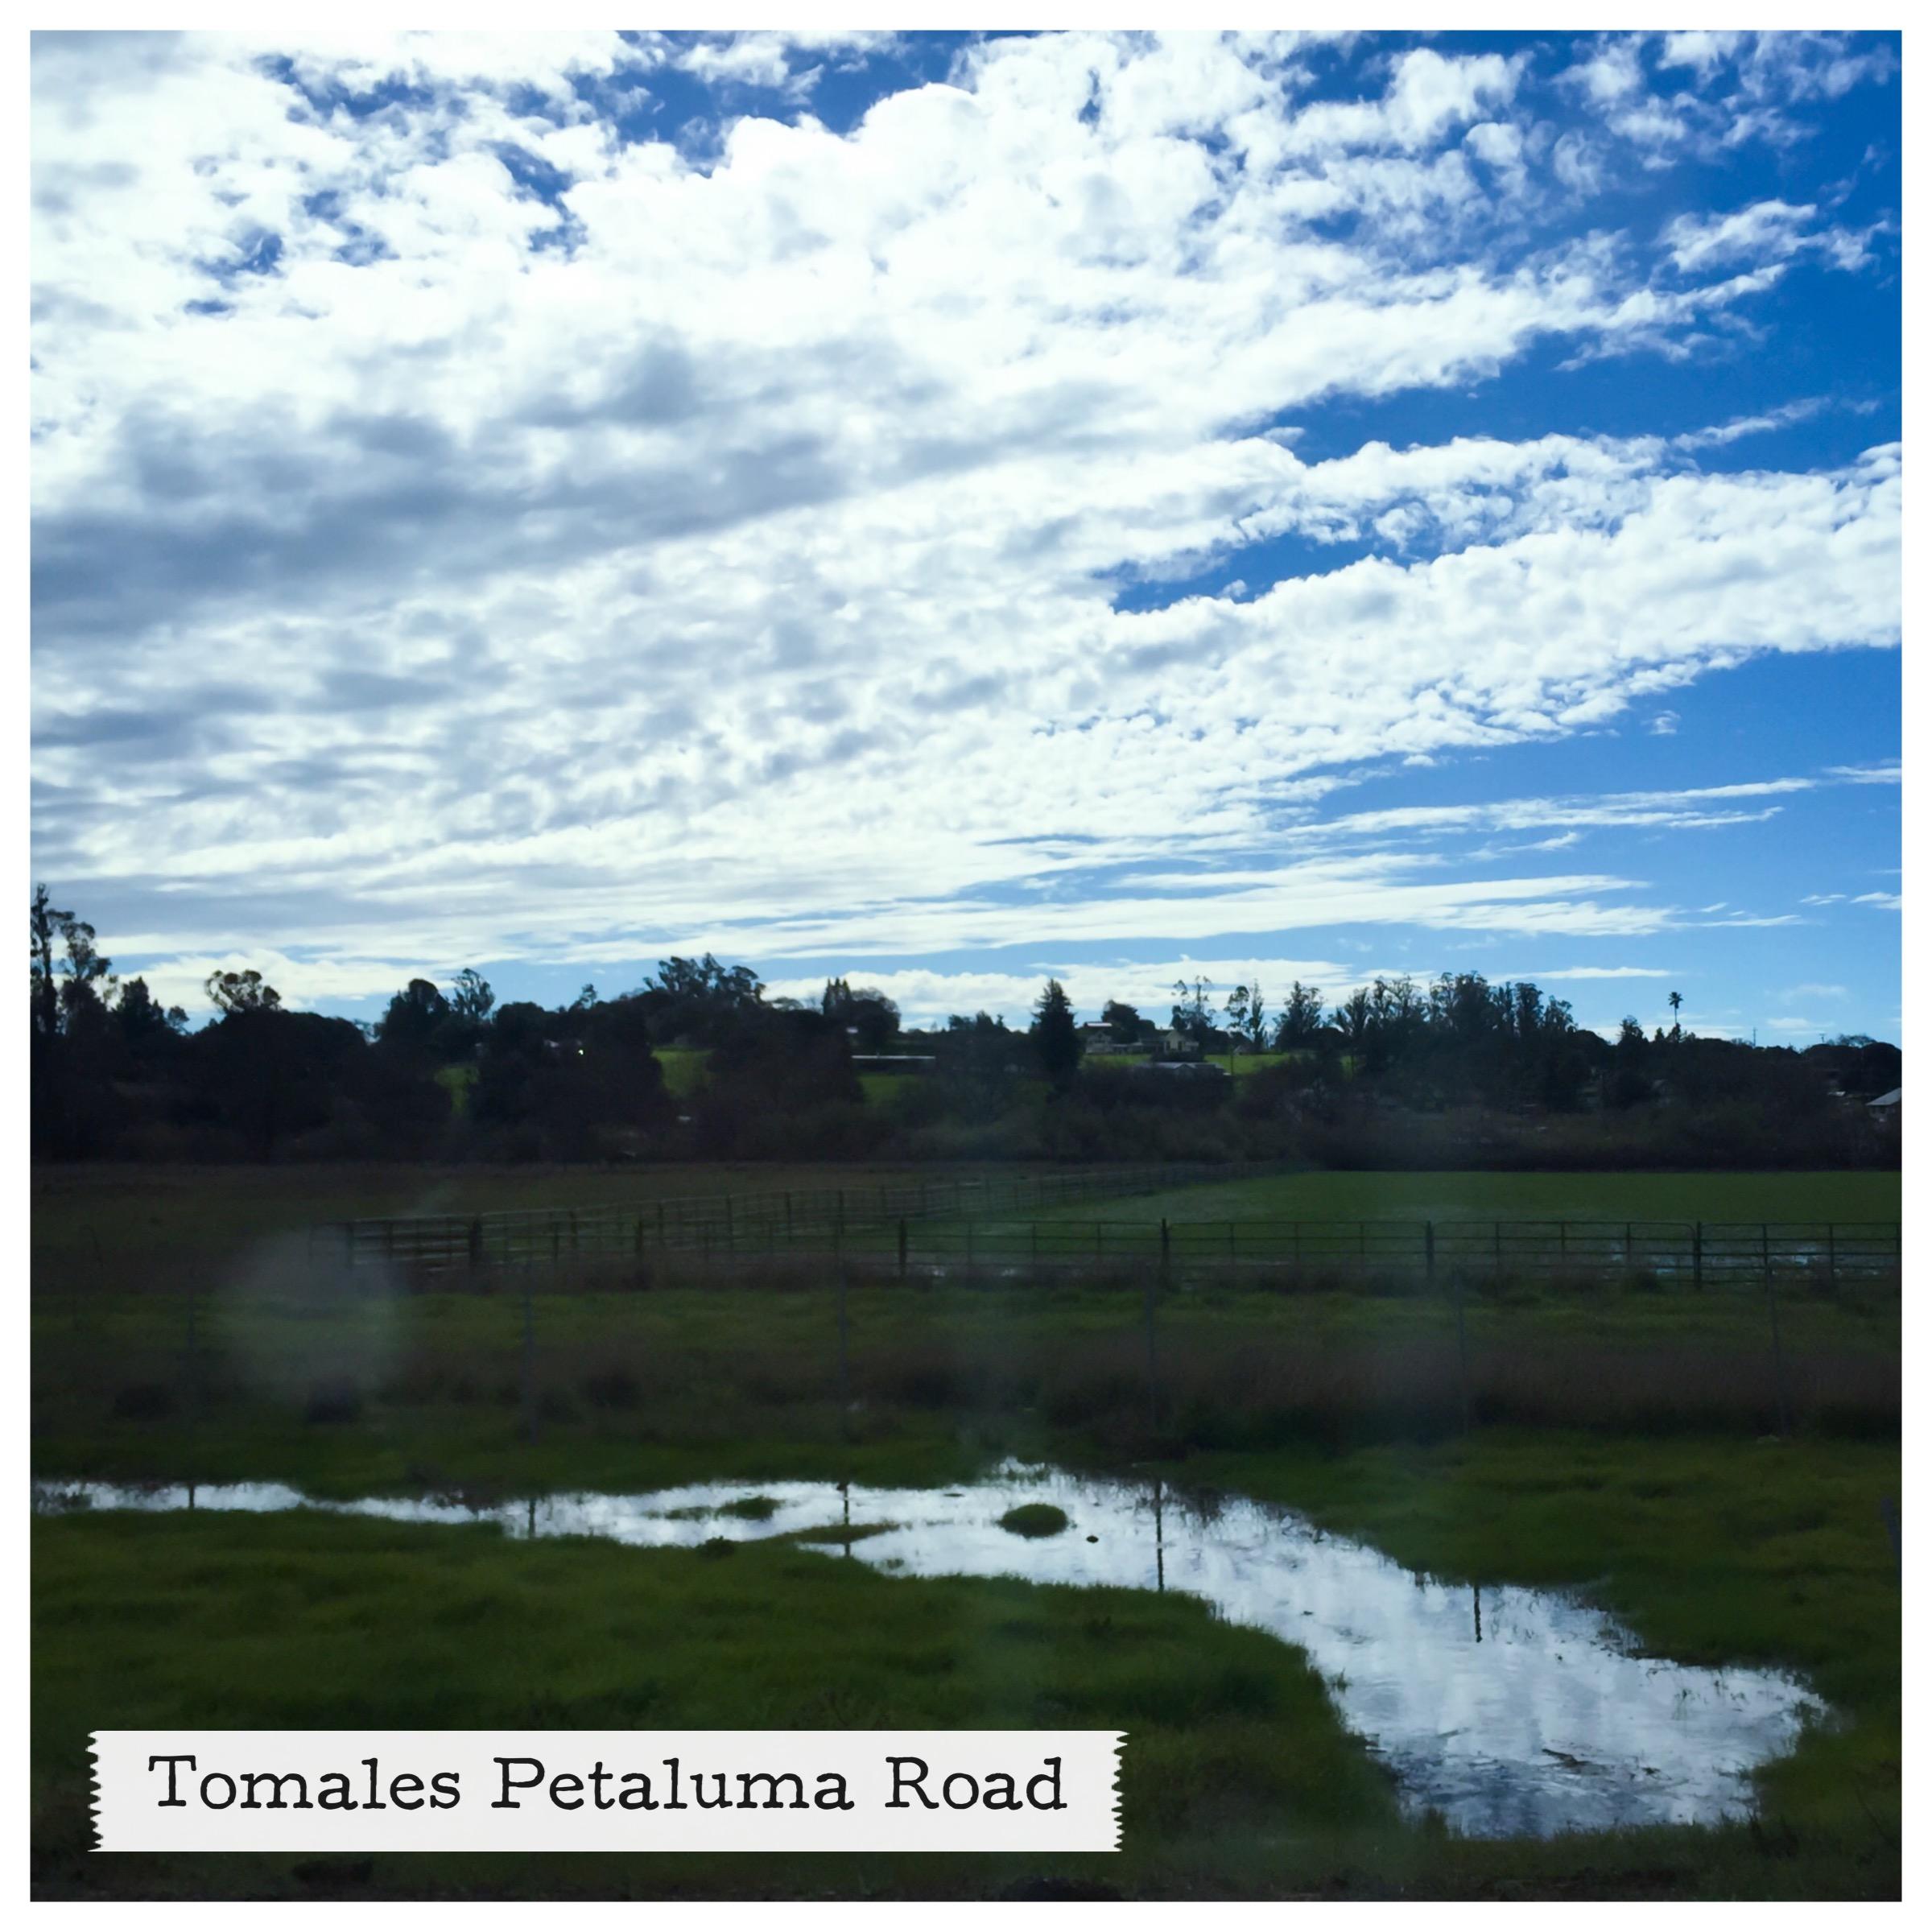 Drive east along Tomales Petaluma Road